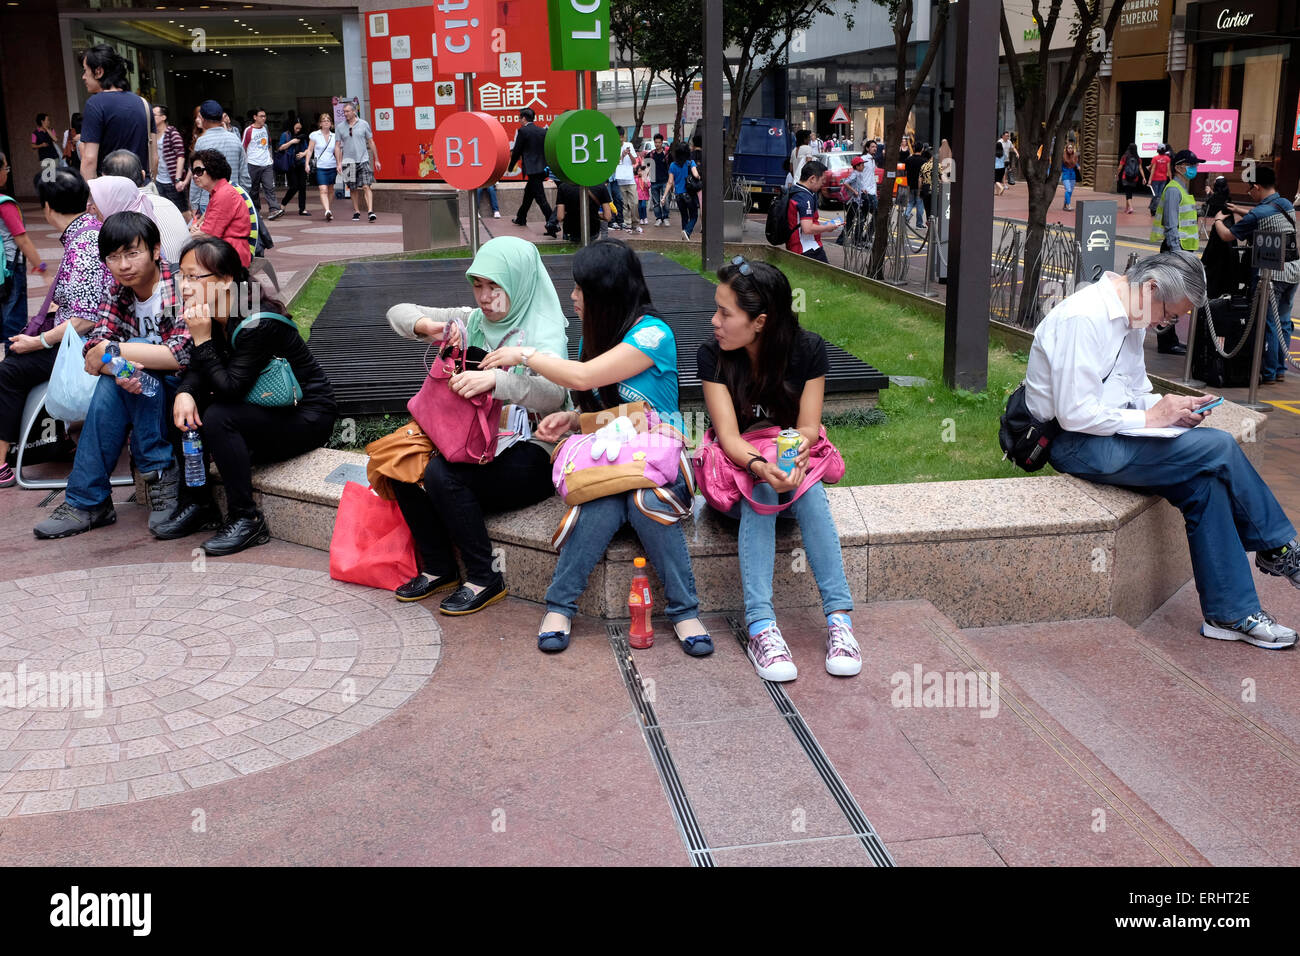 Tourists and locals in Causeway Bay, Hong Kong, SAR, China - Stock Image